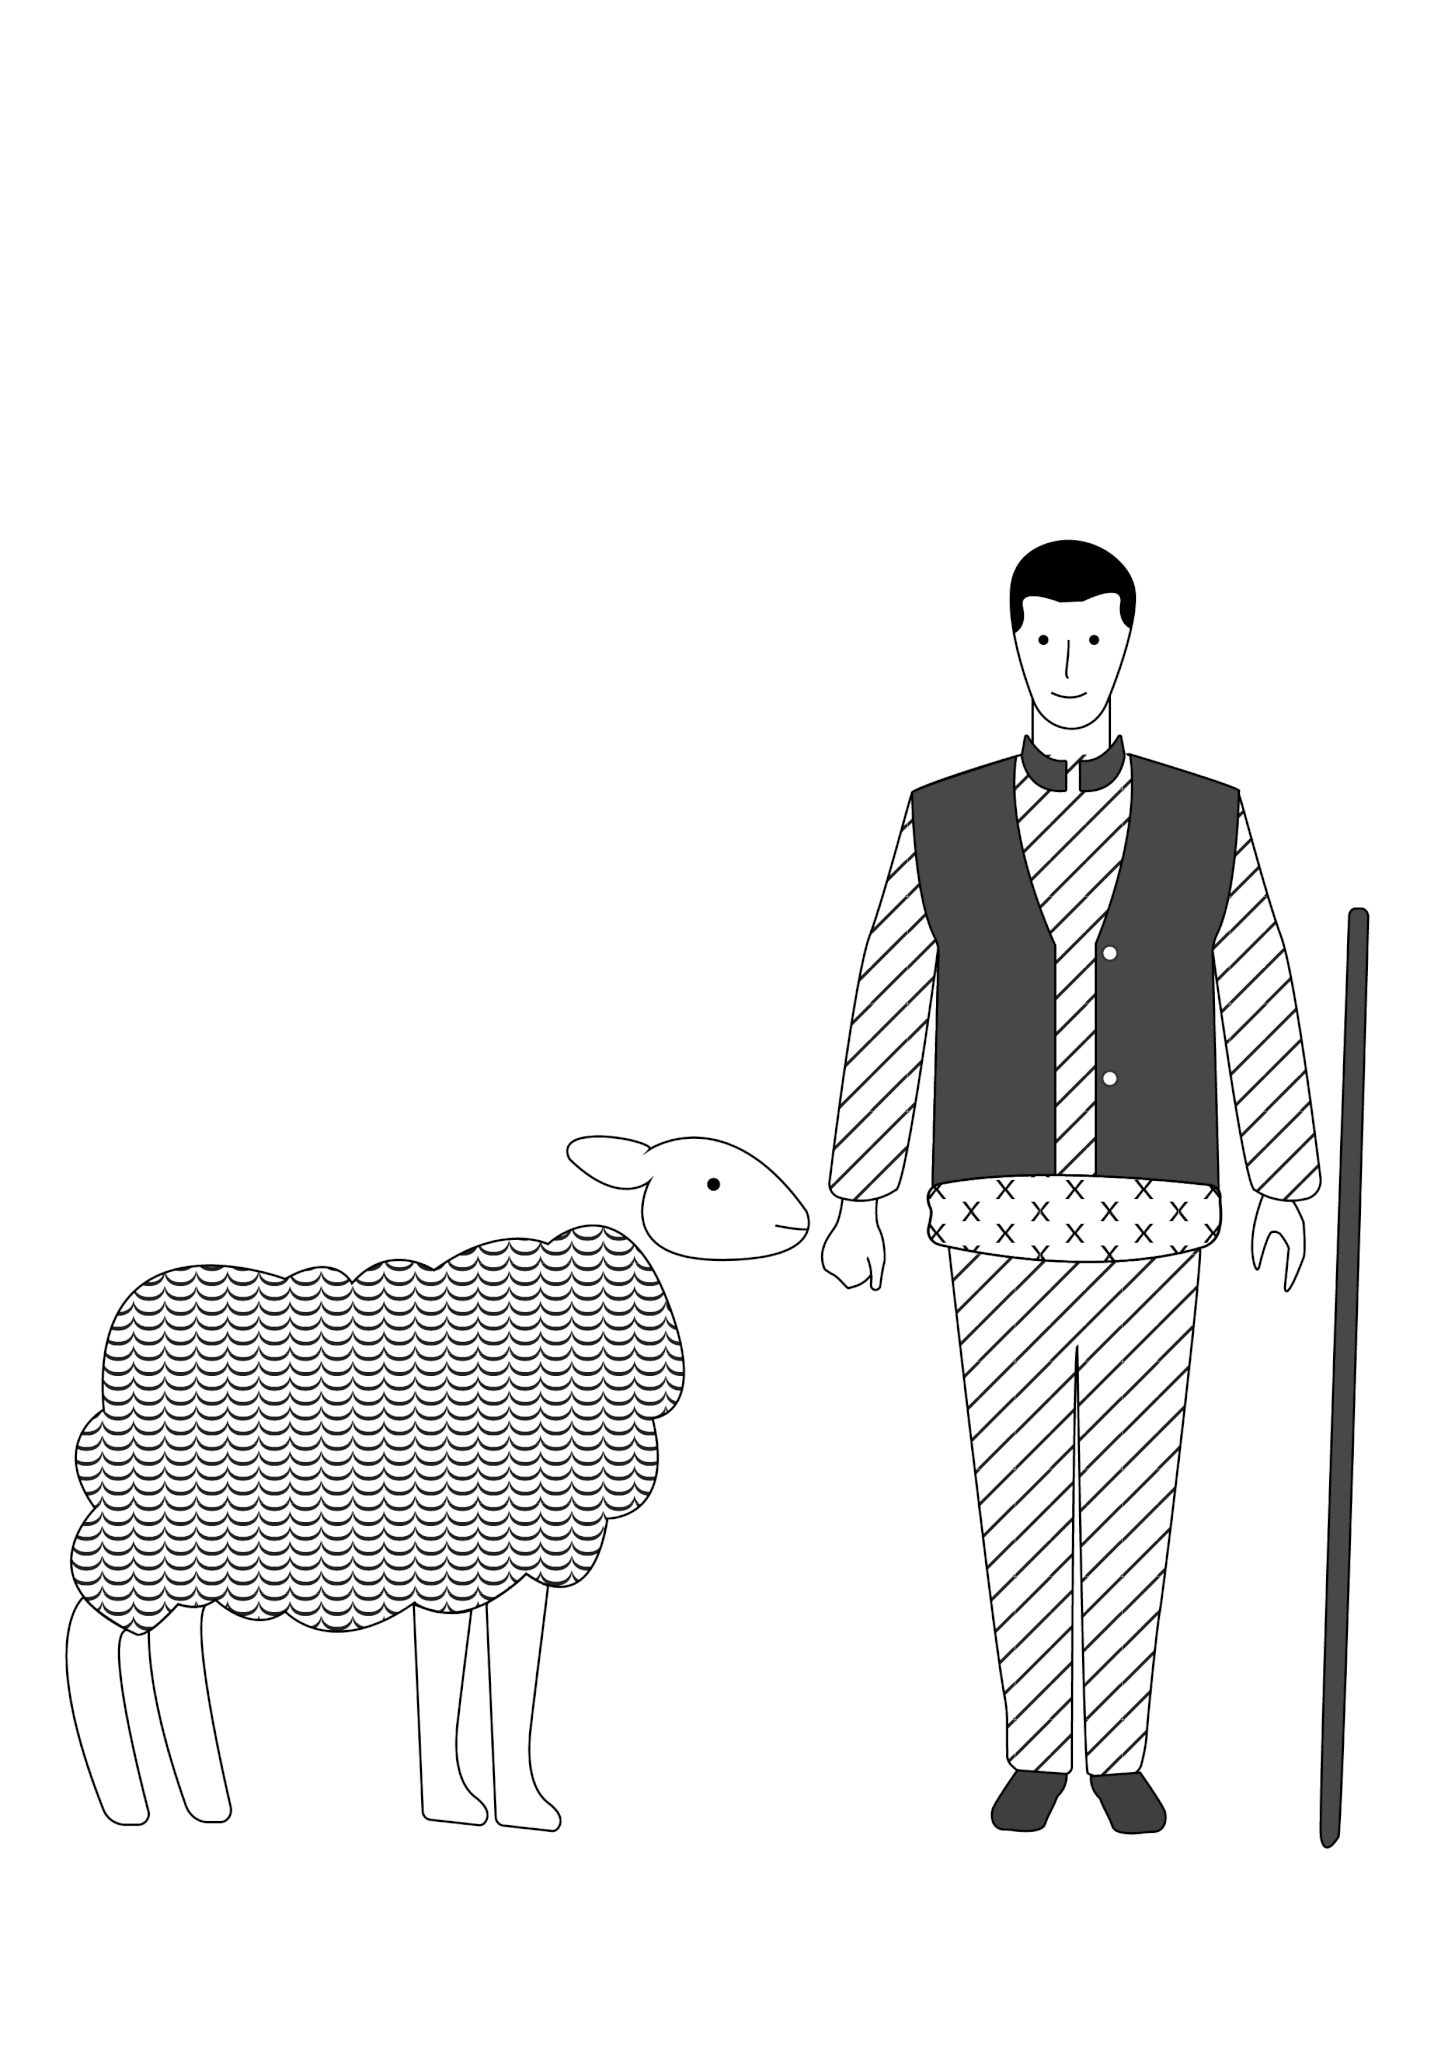 Petrache Lupu